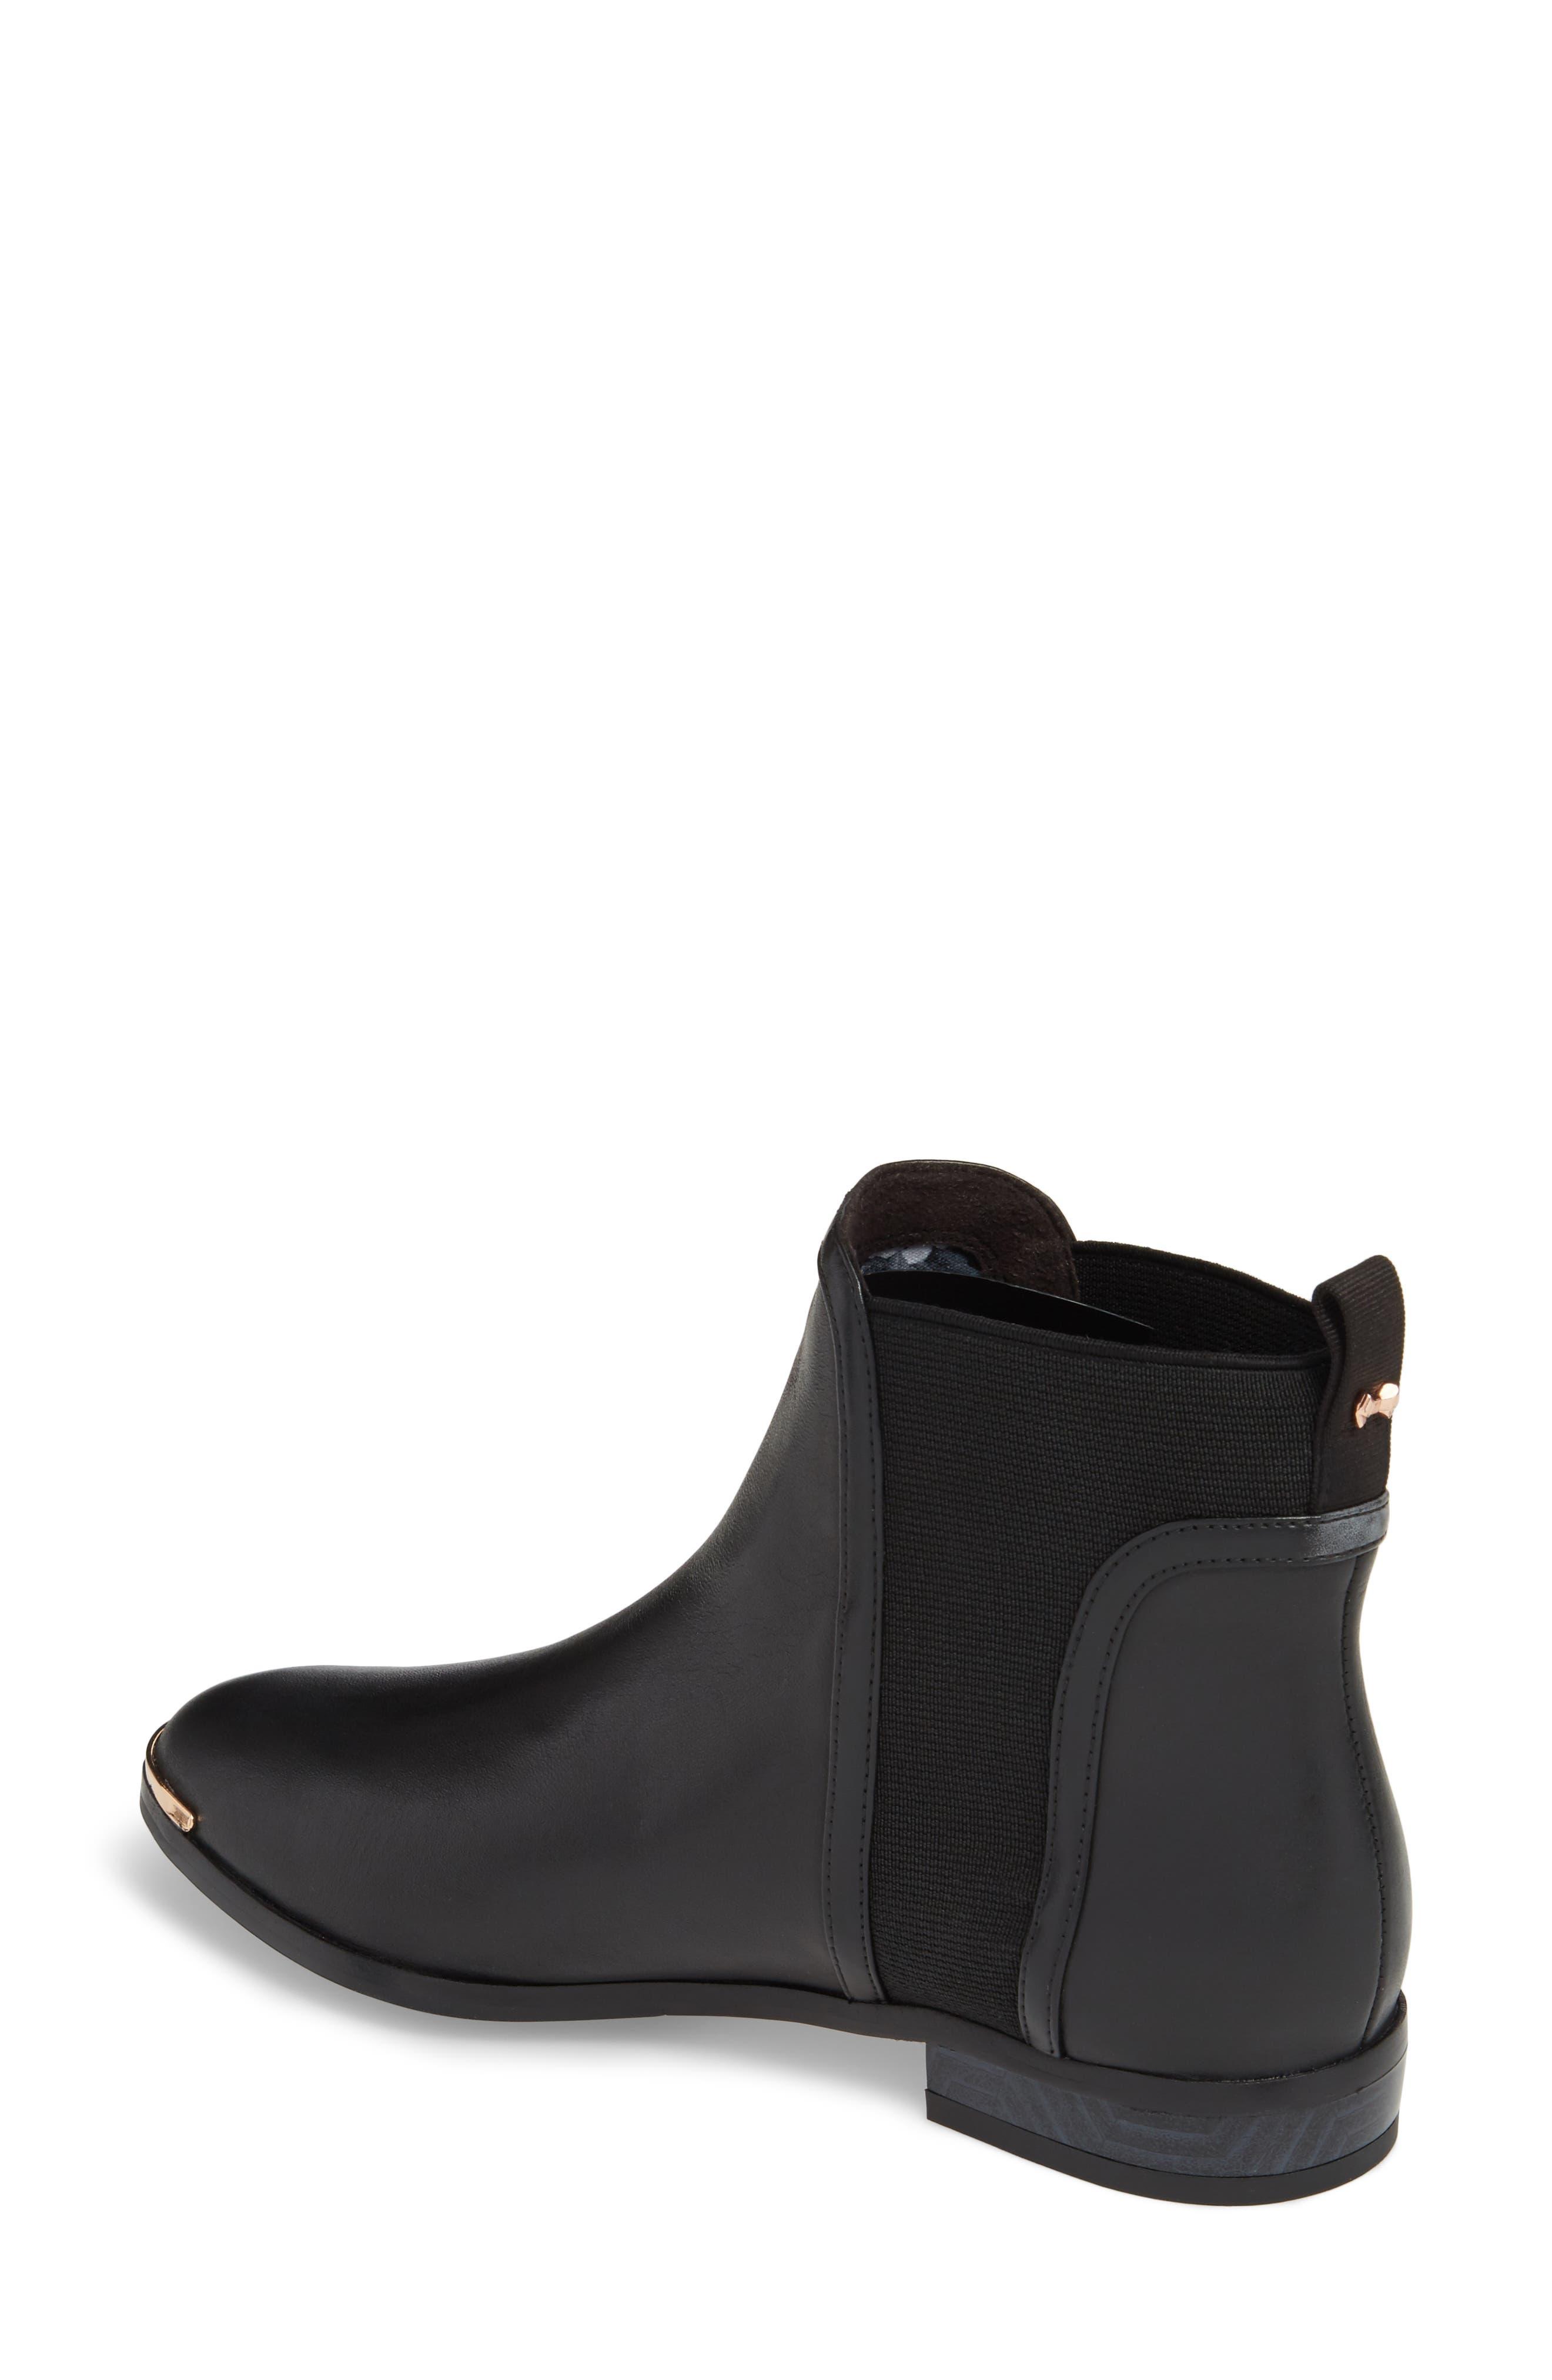 Kerei Chelsea Boot,                             Alternate thumbnail 2, color,                             Black Leather